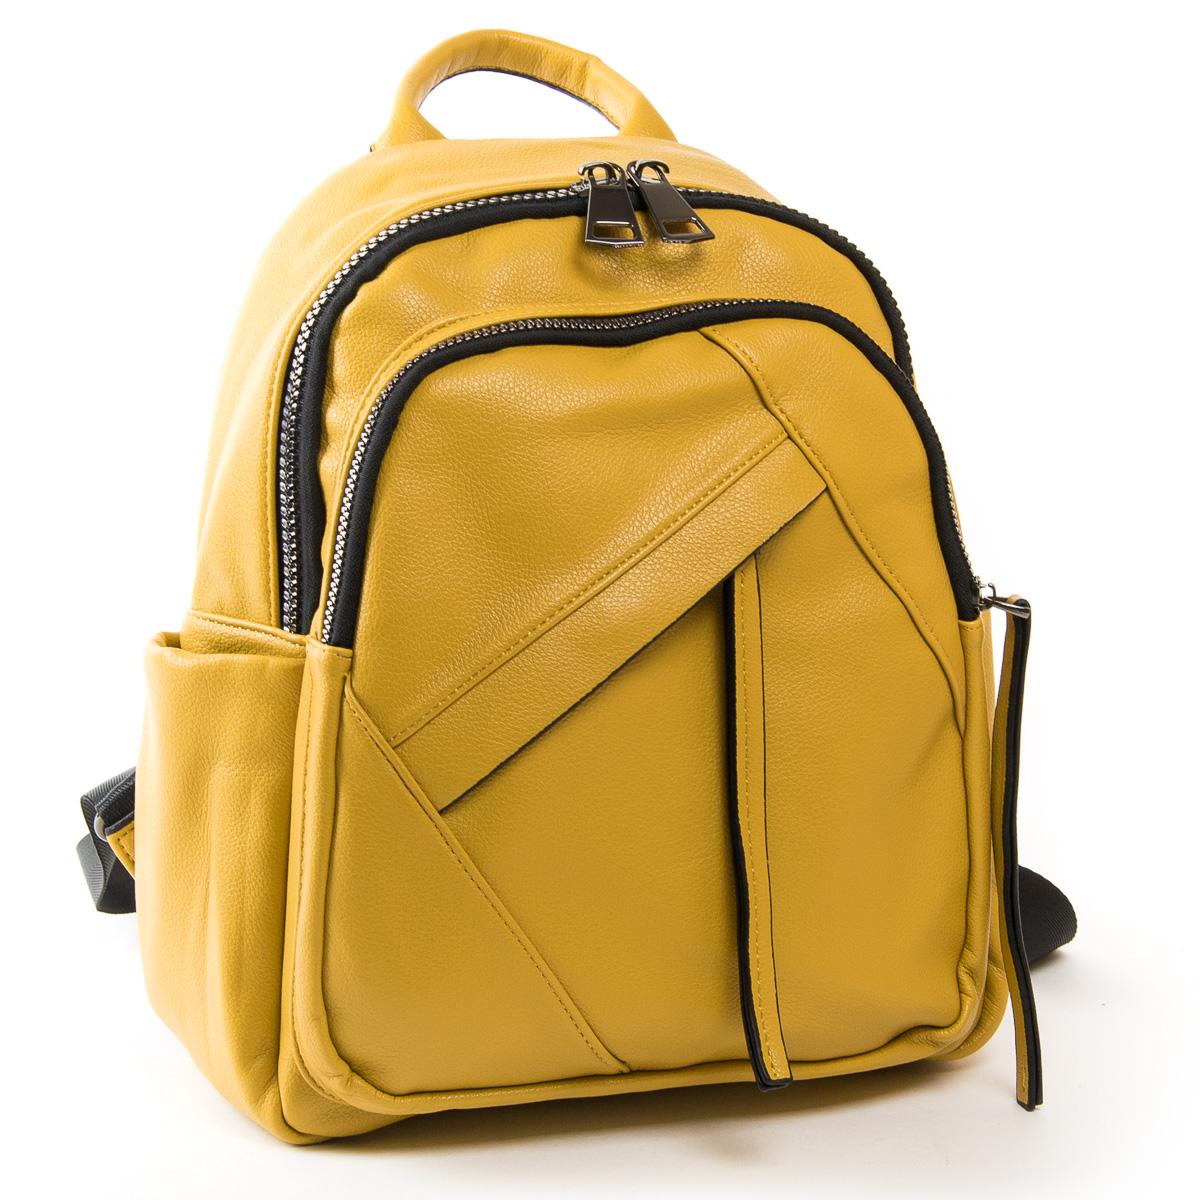 Сумка Женская Рюкзак иск-кожа FASHION 01-02 871 yellow